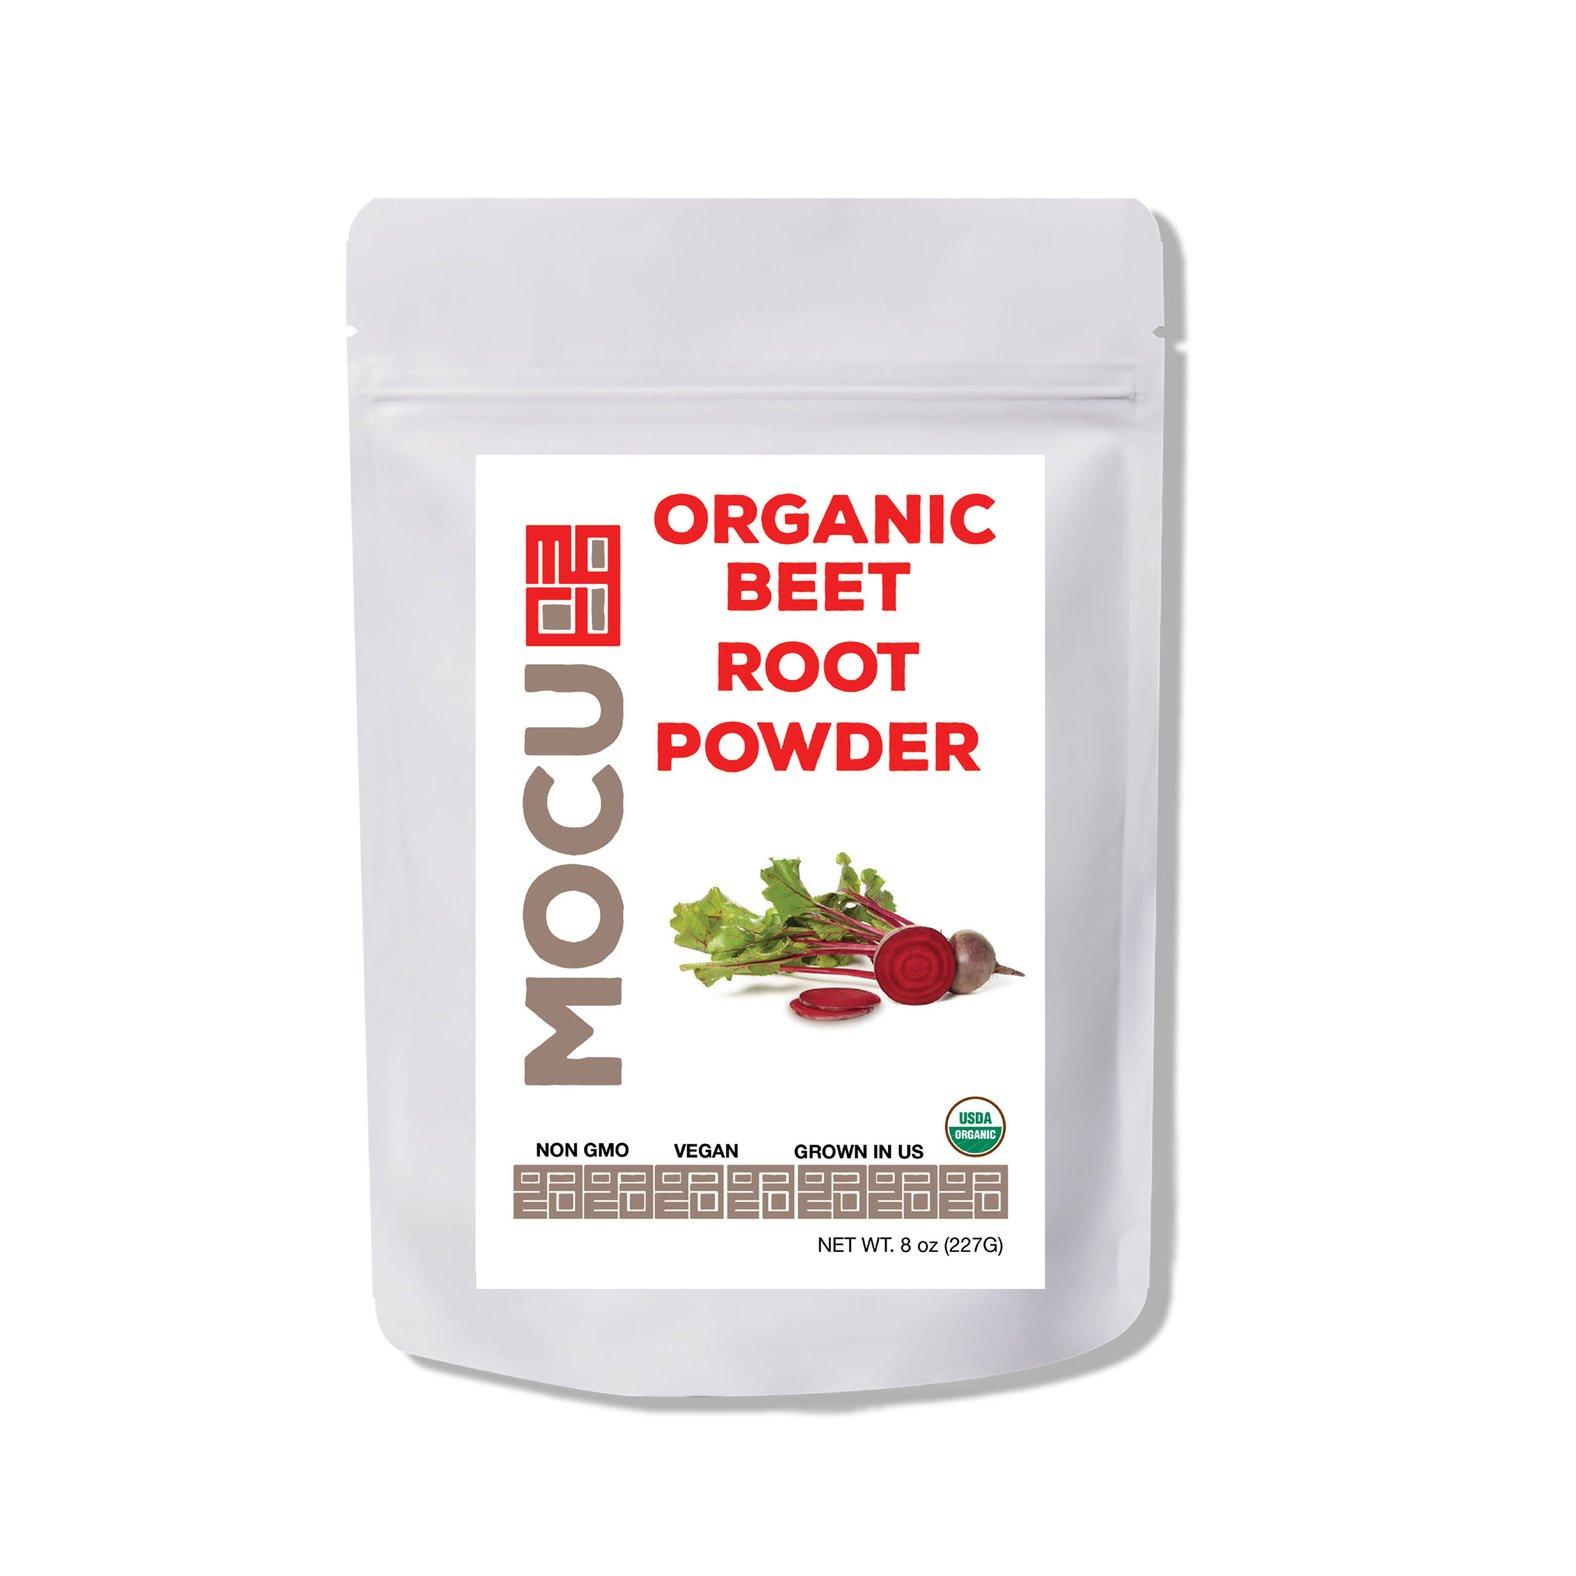 mocu-organic-beet-root-powder-front.jpg